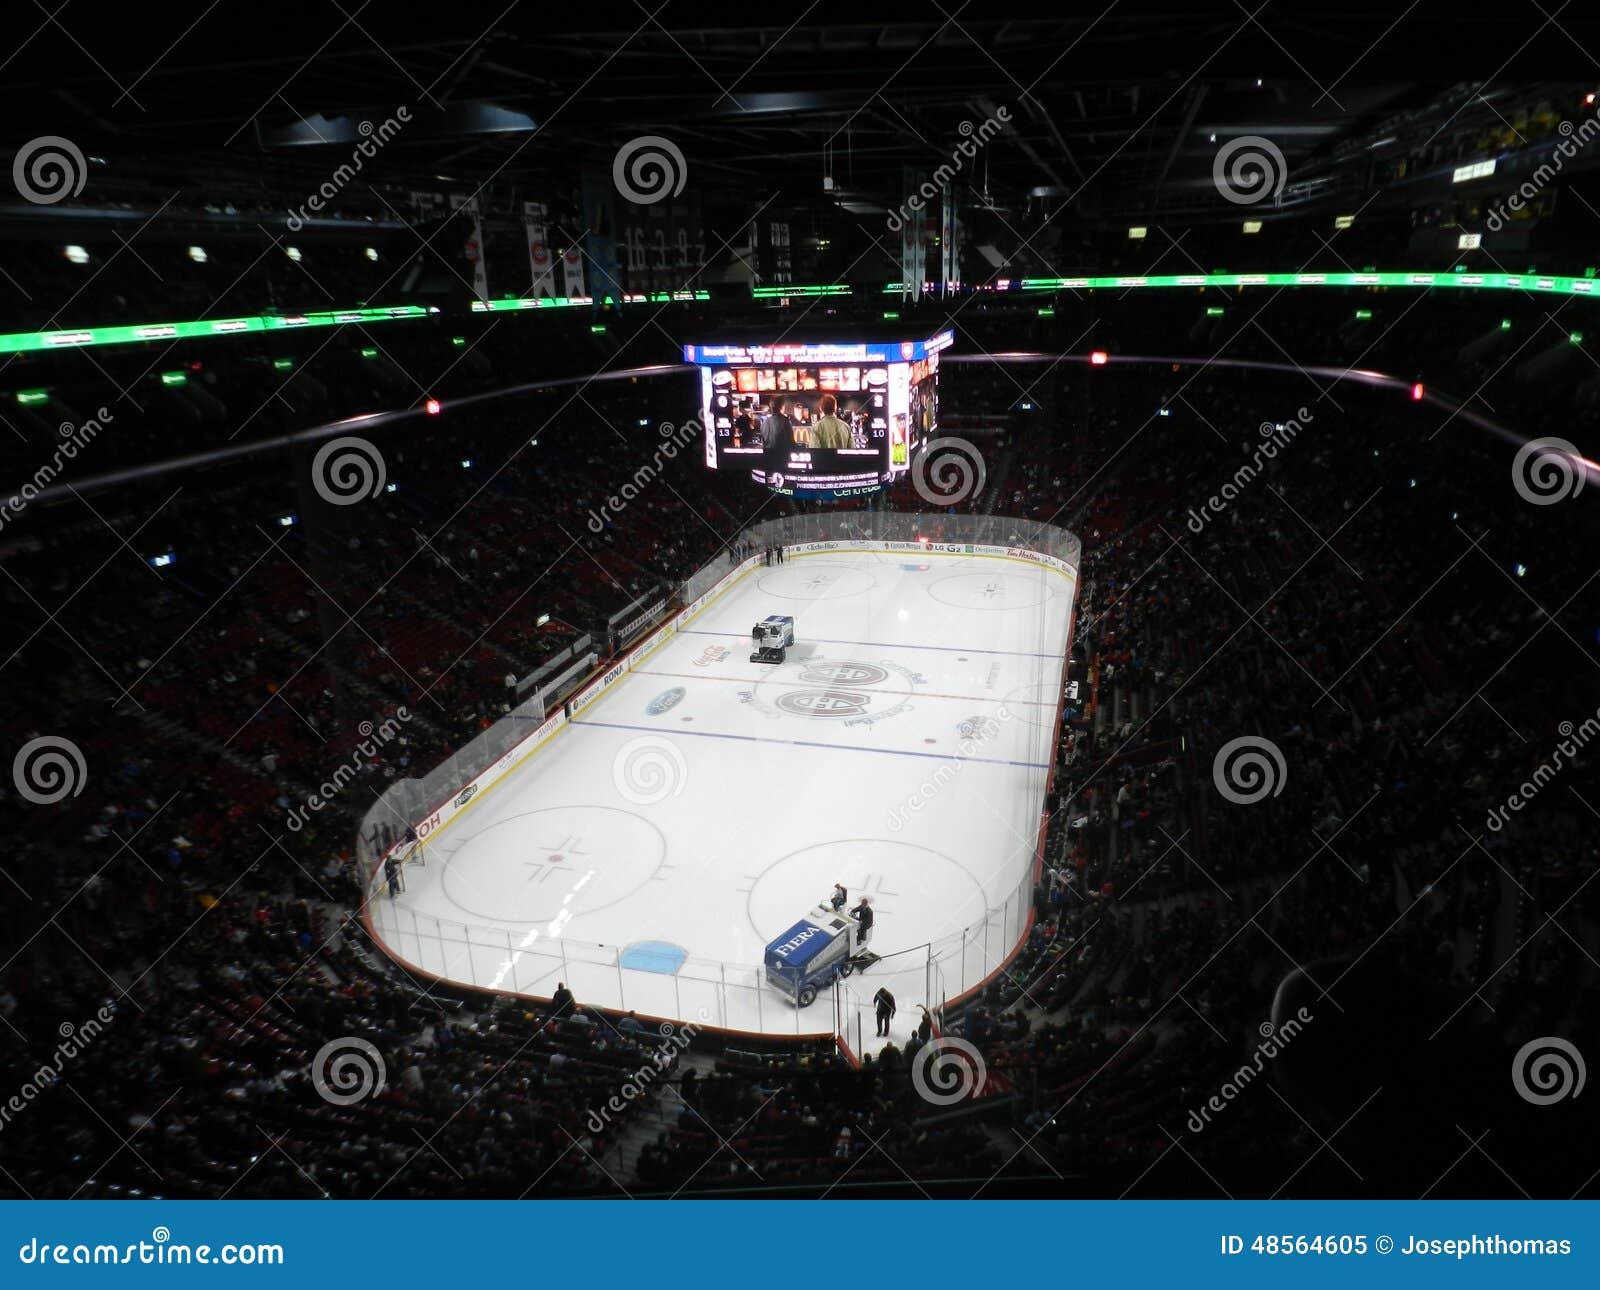 Hockey Nhl Professional Sports Zamboni In Nhl Game Of